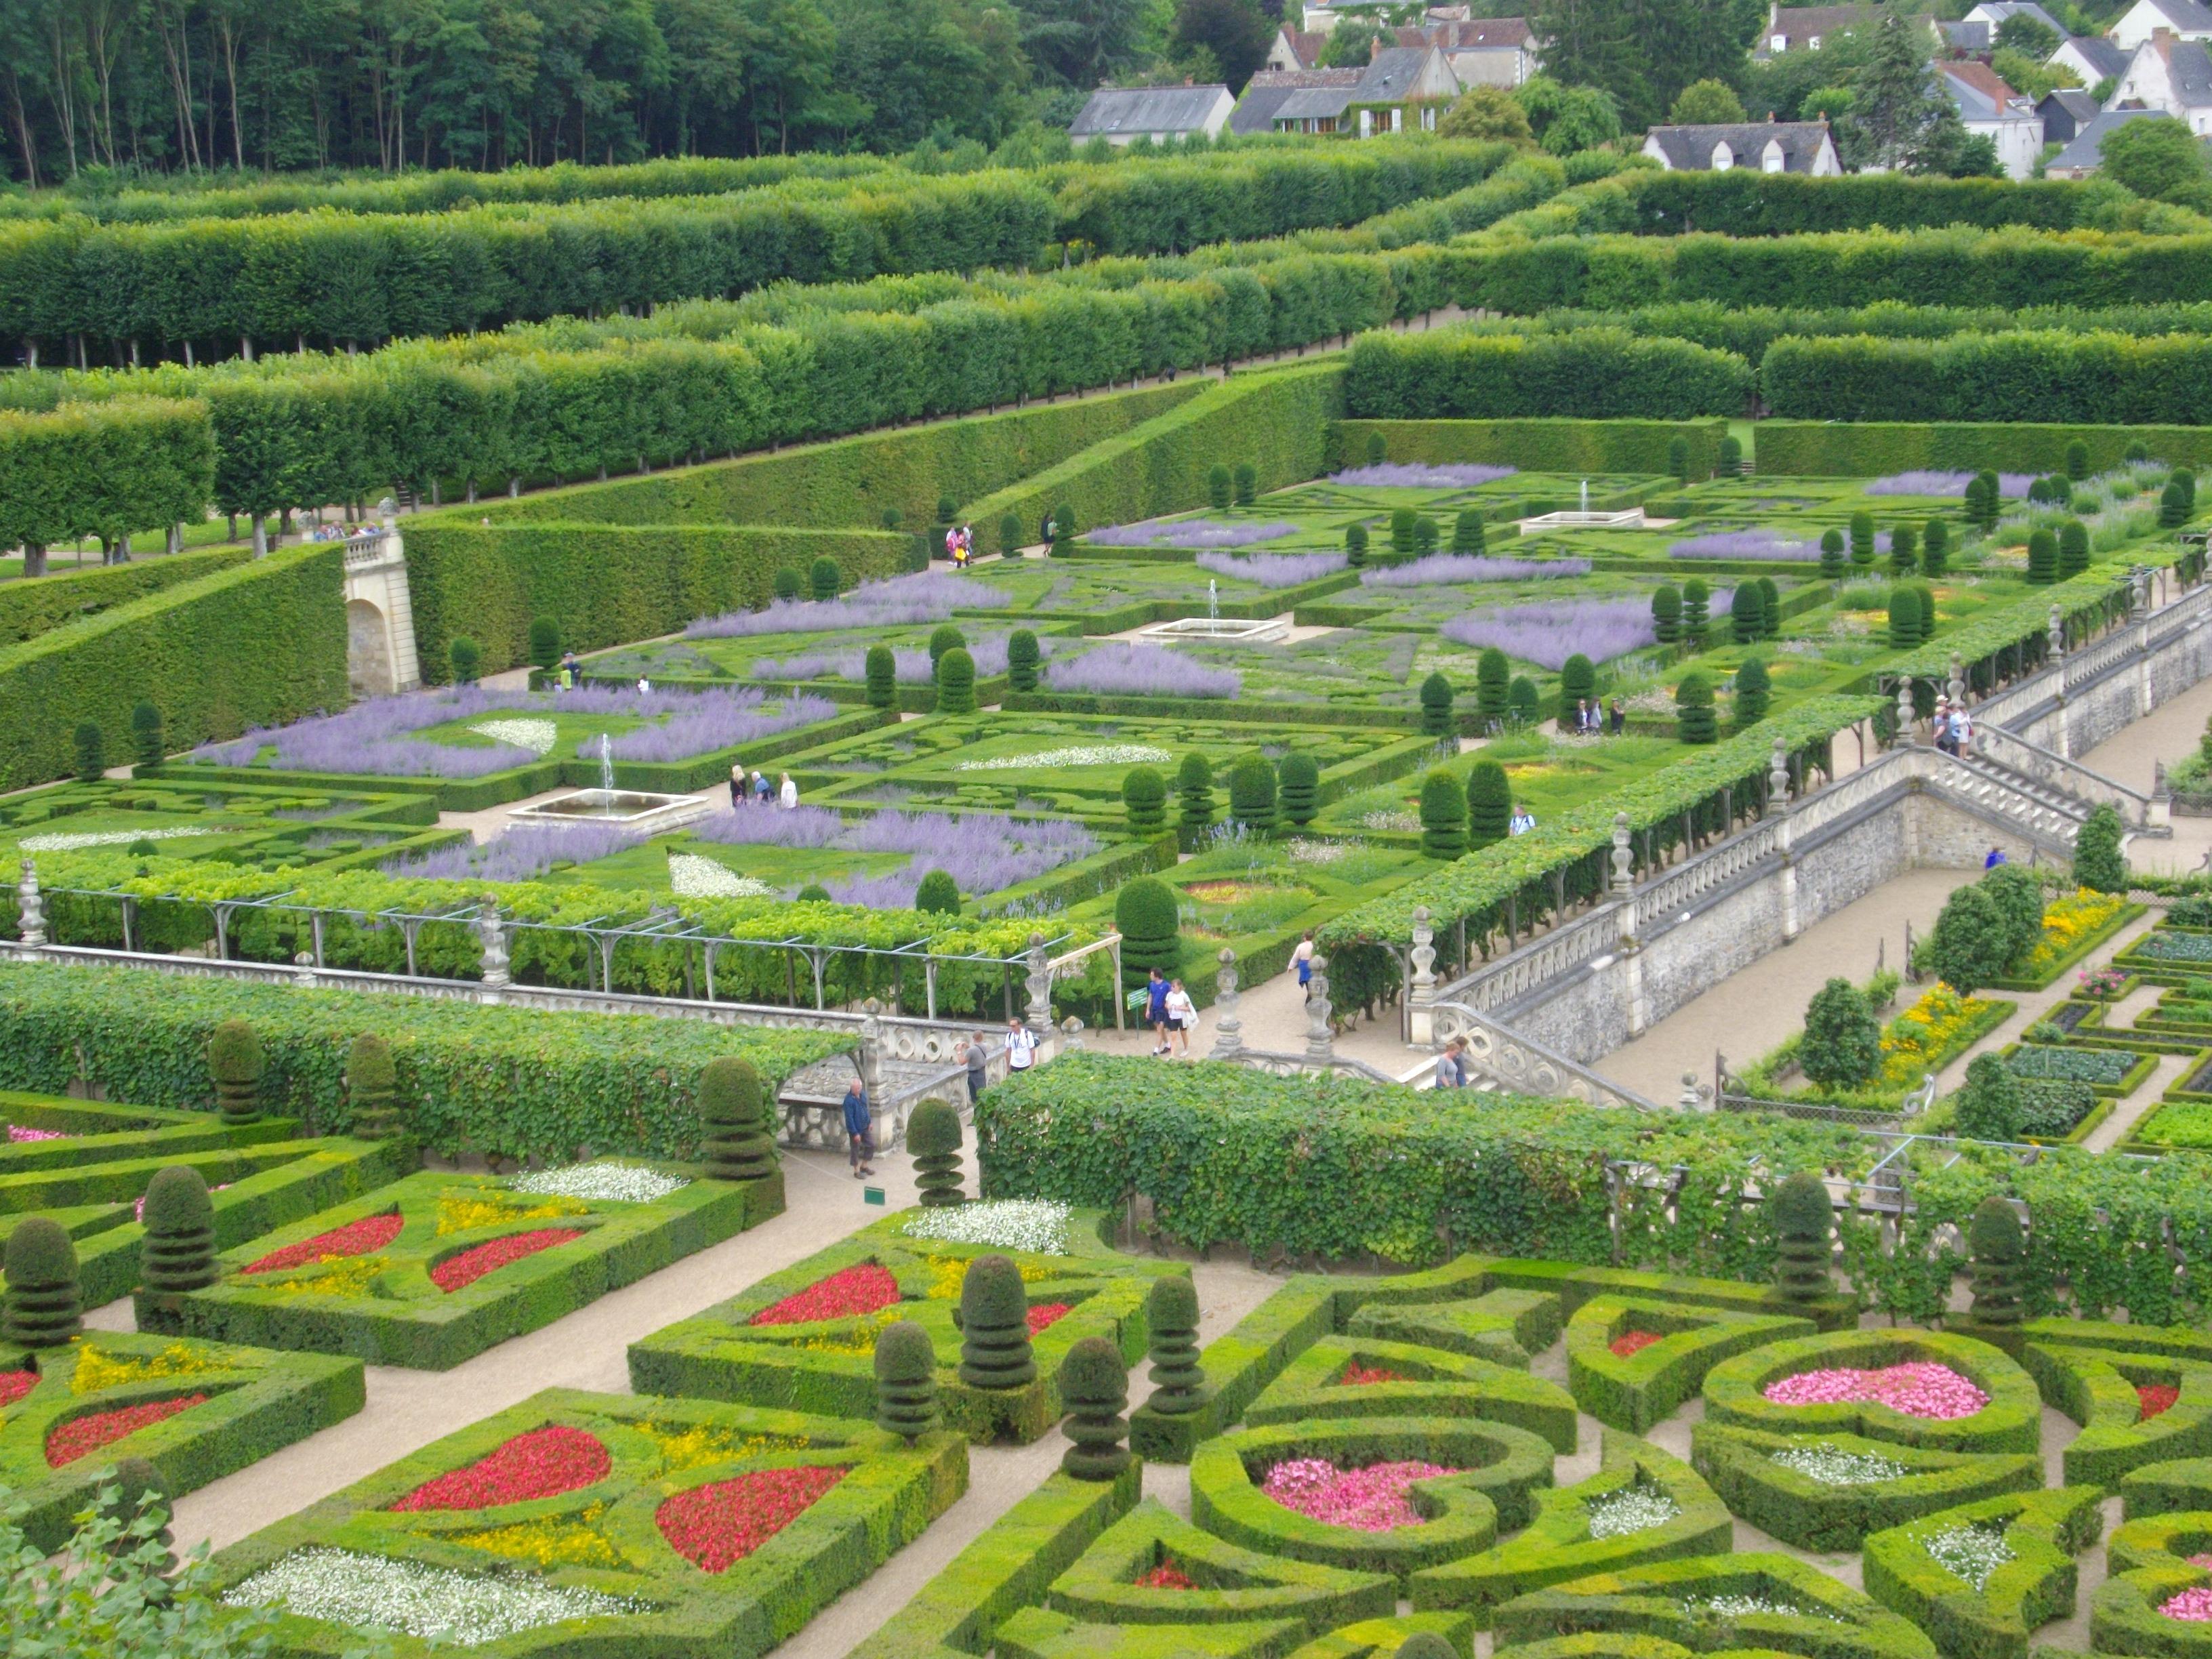 File:Villandry - château, jardin d\'ornement (14).jpg - Wikimedia Commons